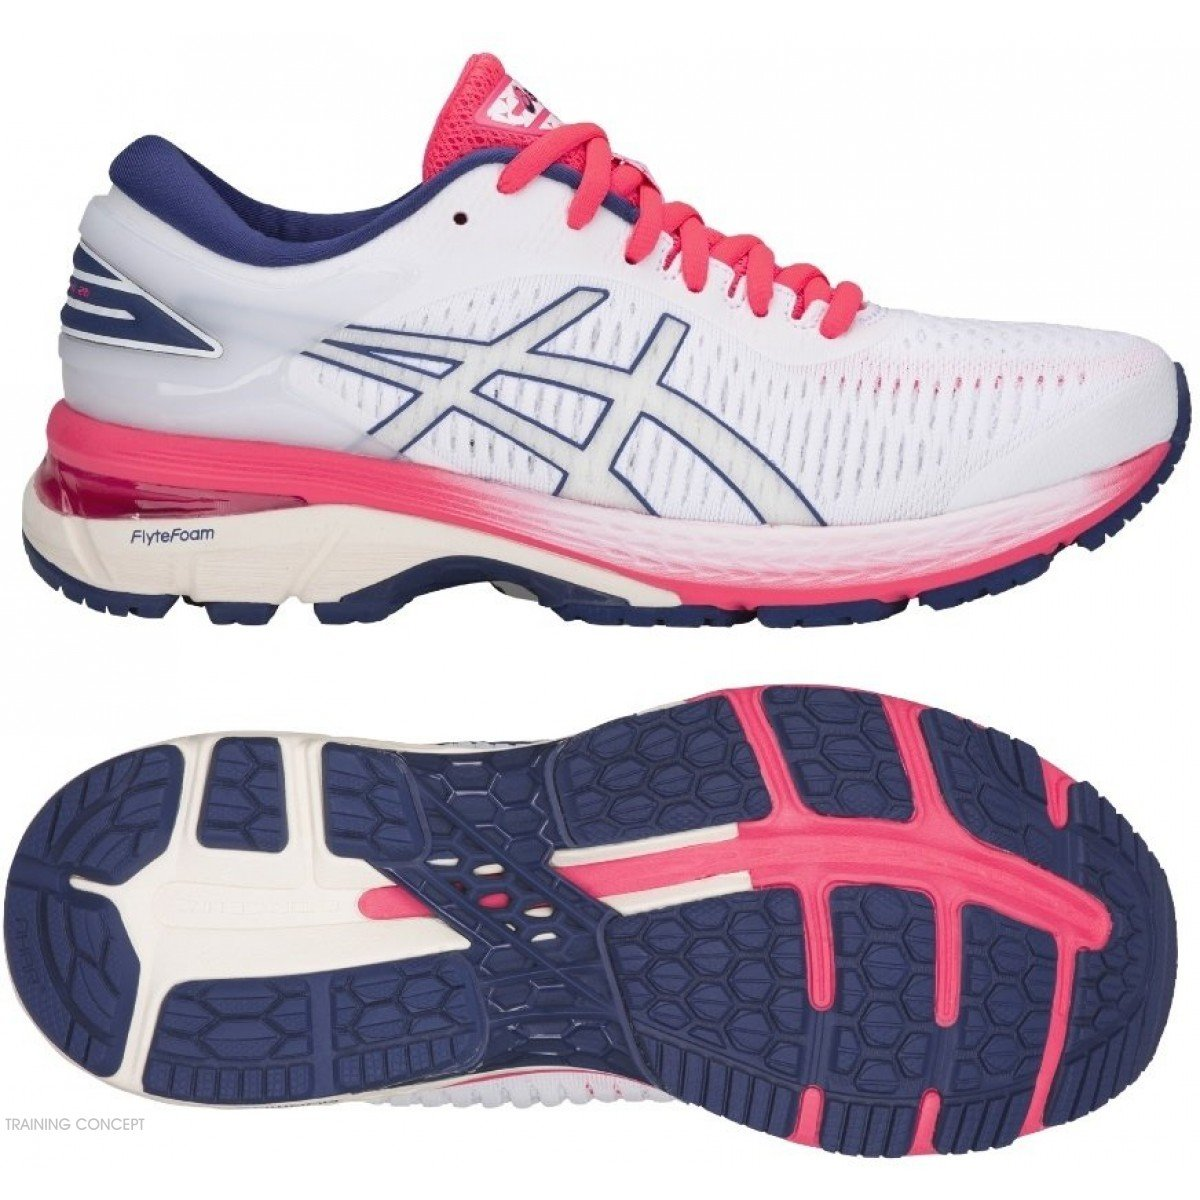 Asics Femmes Gel Kayano 25 Pour Chaussure De Running W9I2EDH